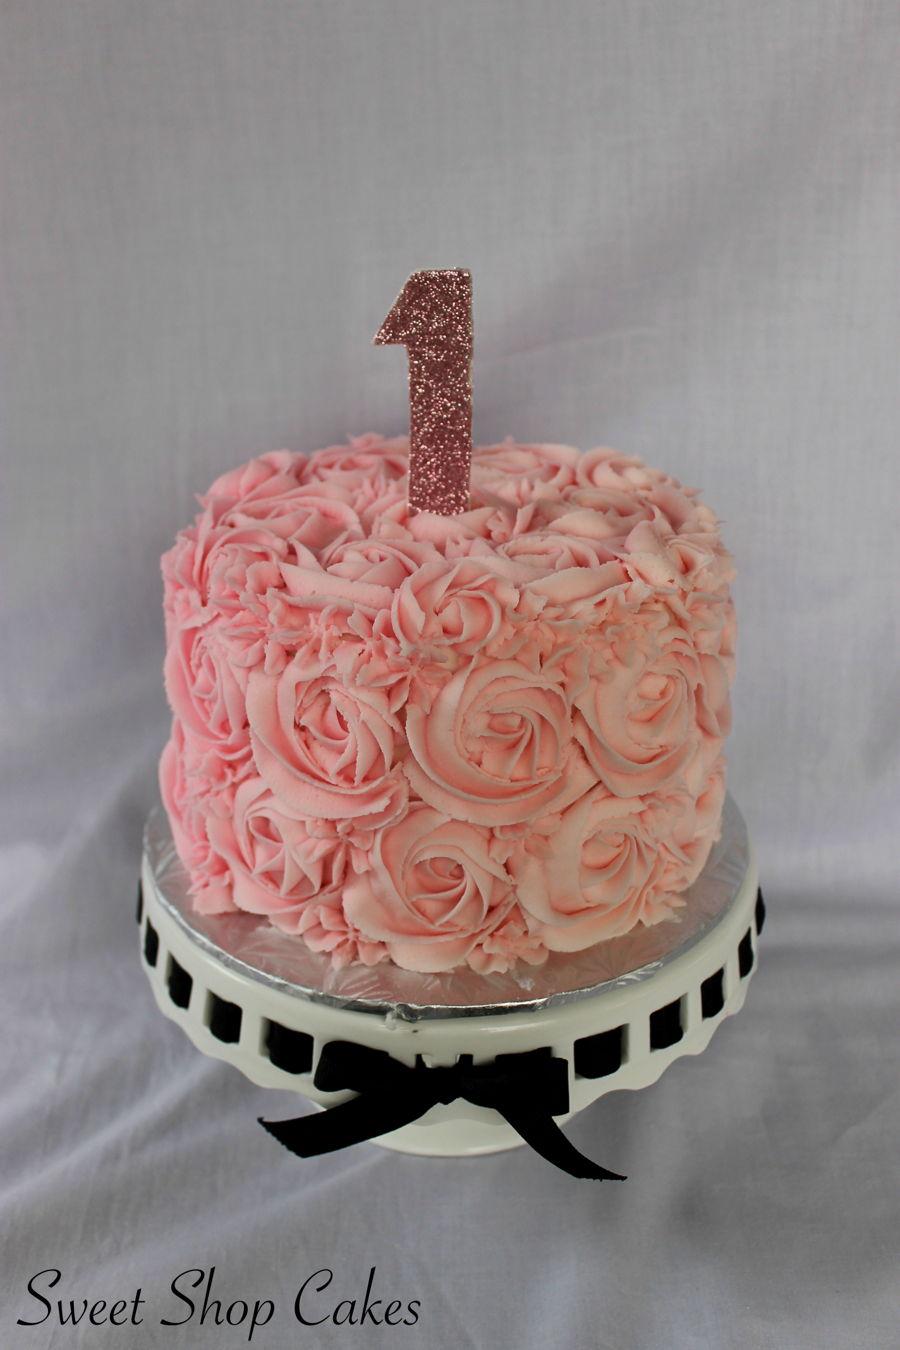 900_rosette-smash-cake-9375121wqNq.jpg